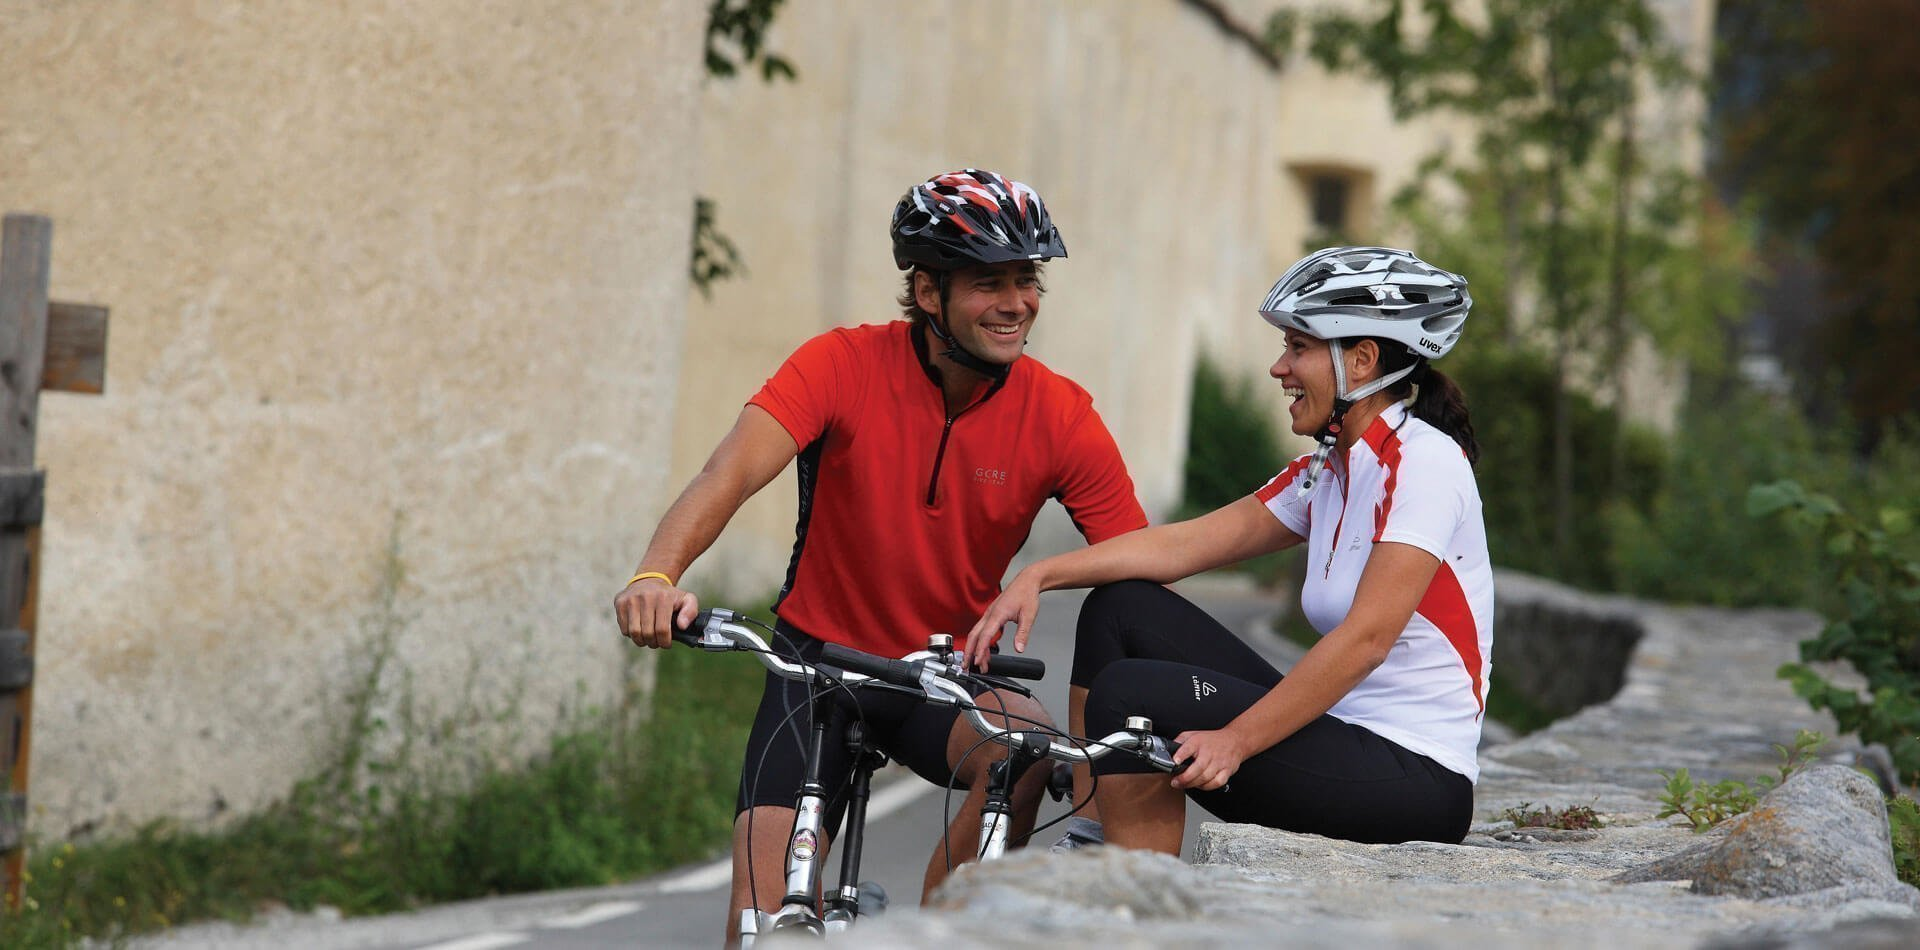 bikeurlaub suedtirol